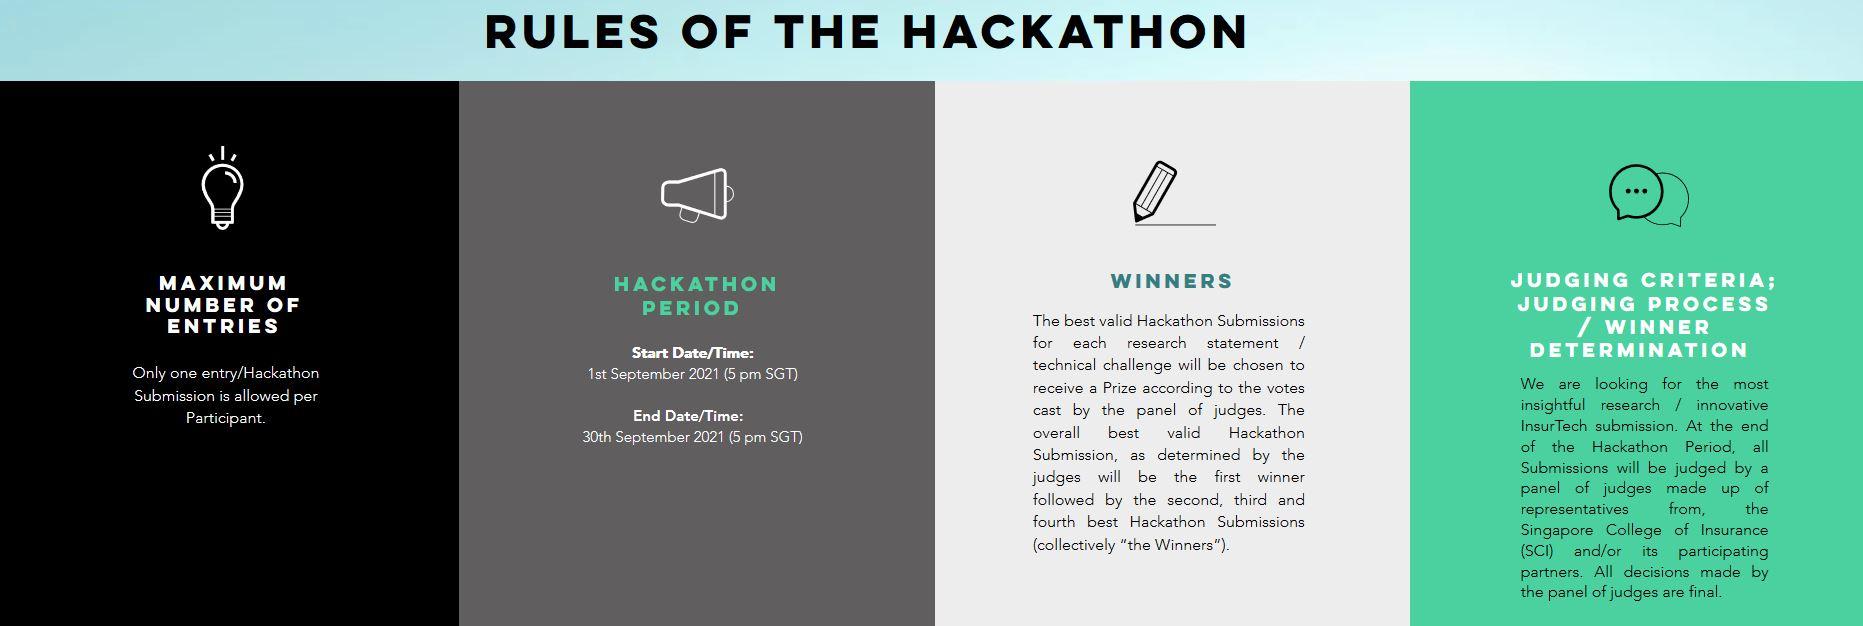 SCI ASEAN Green Research Hackathon